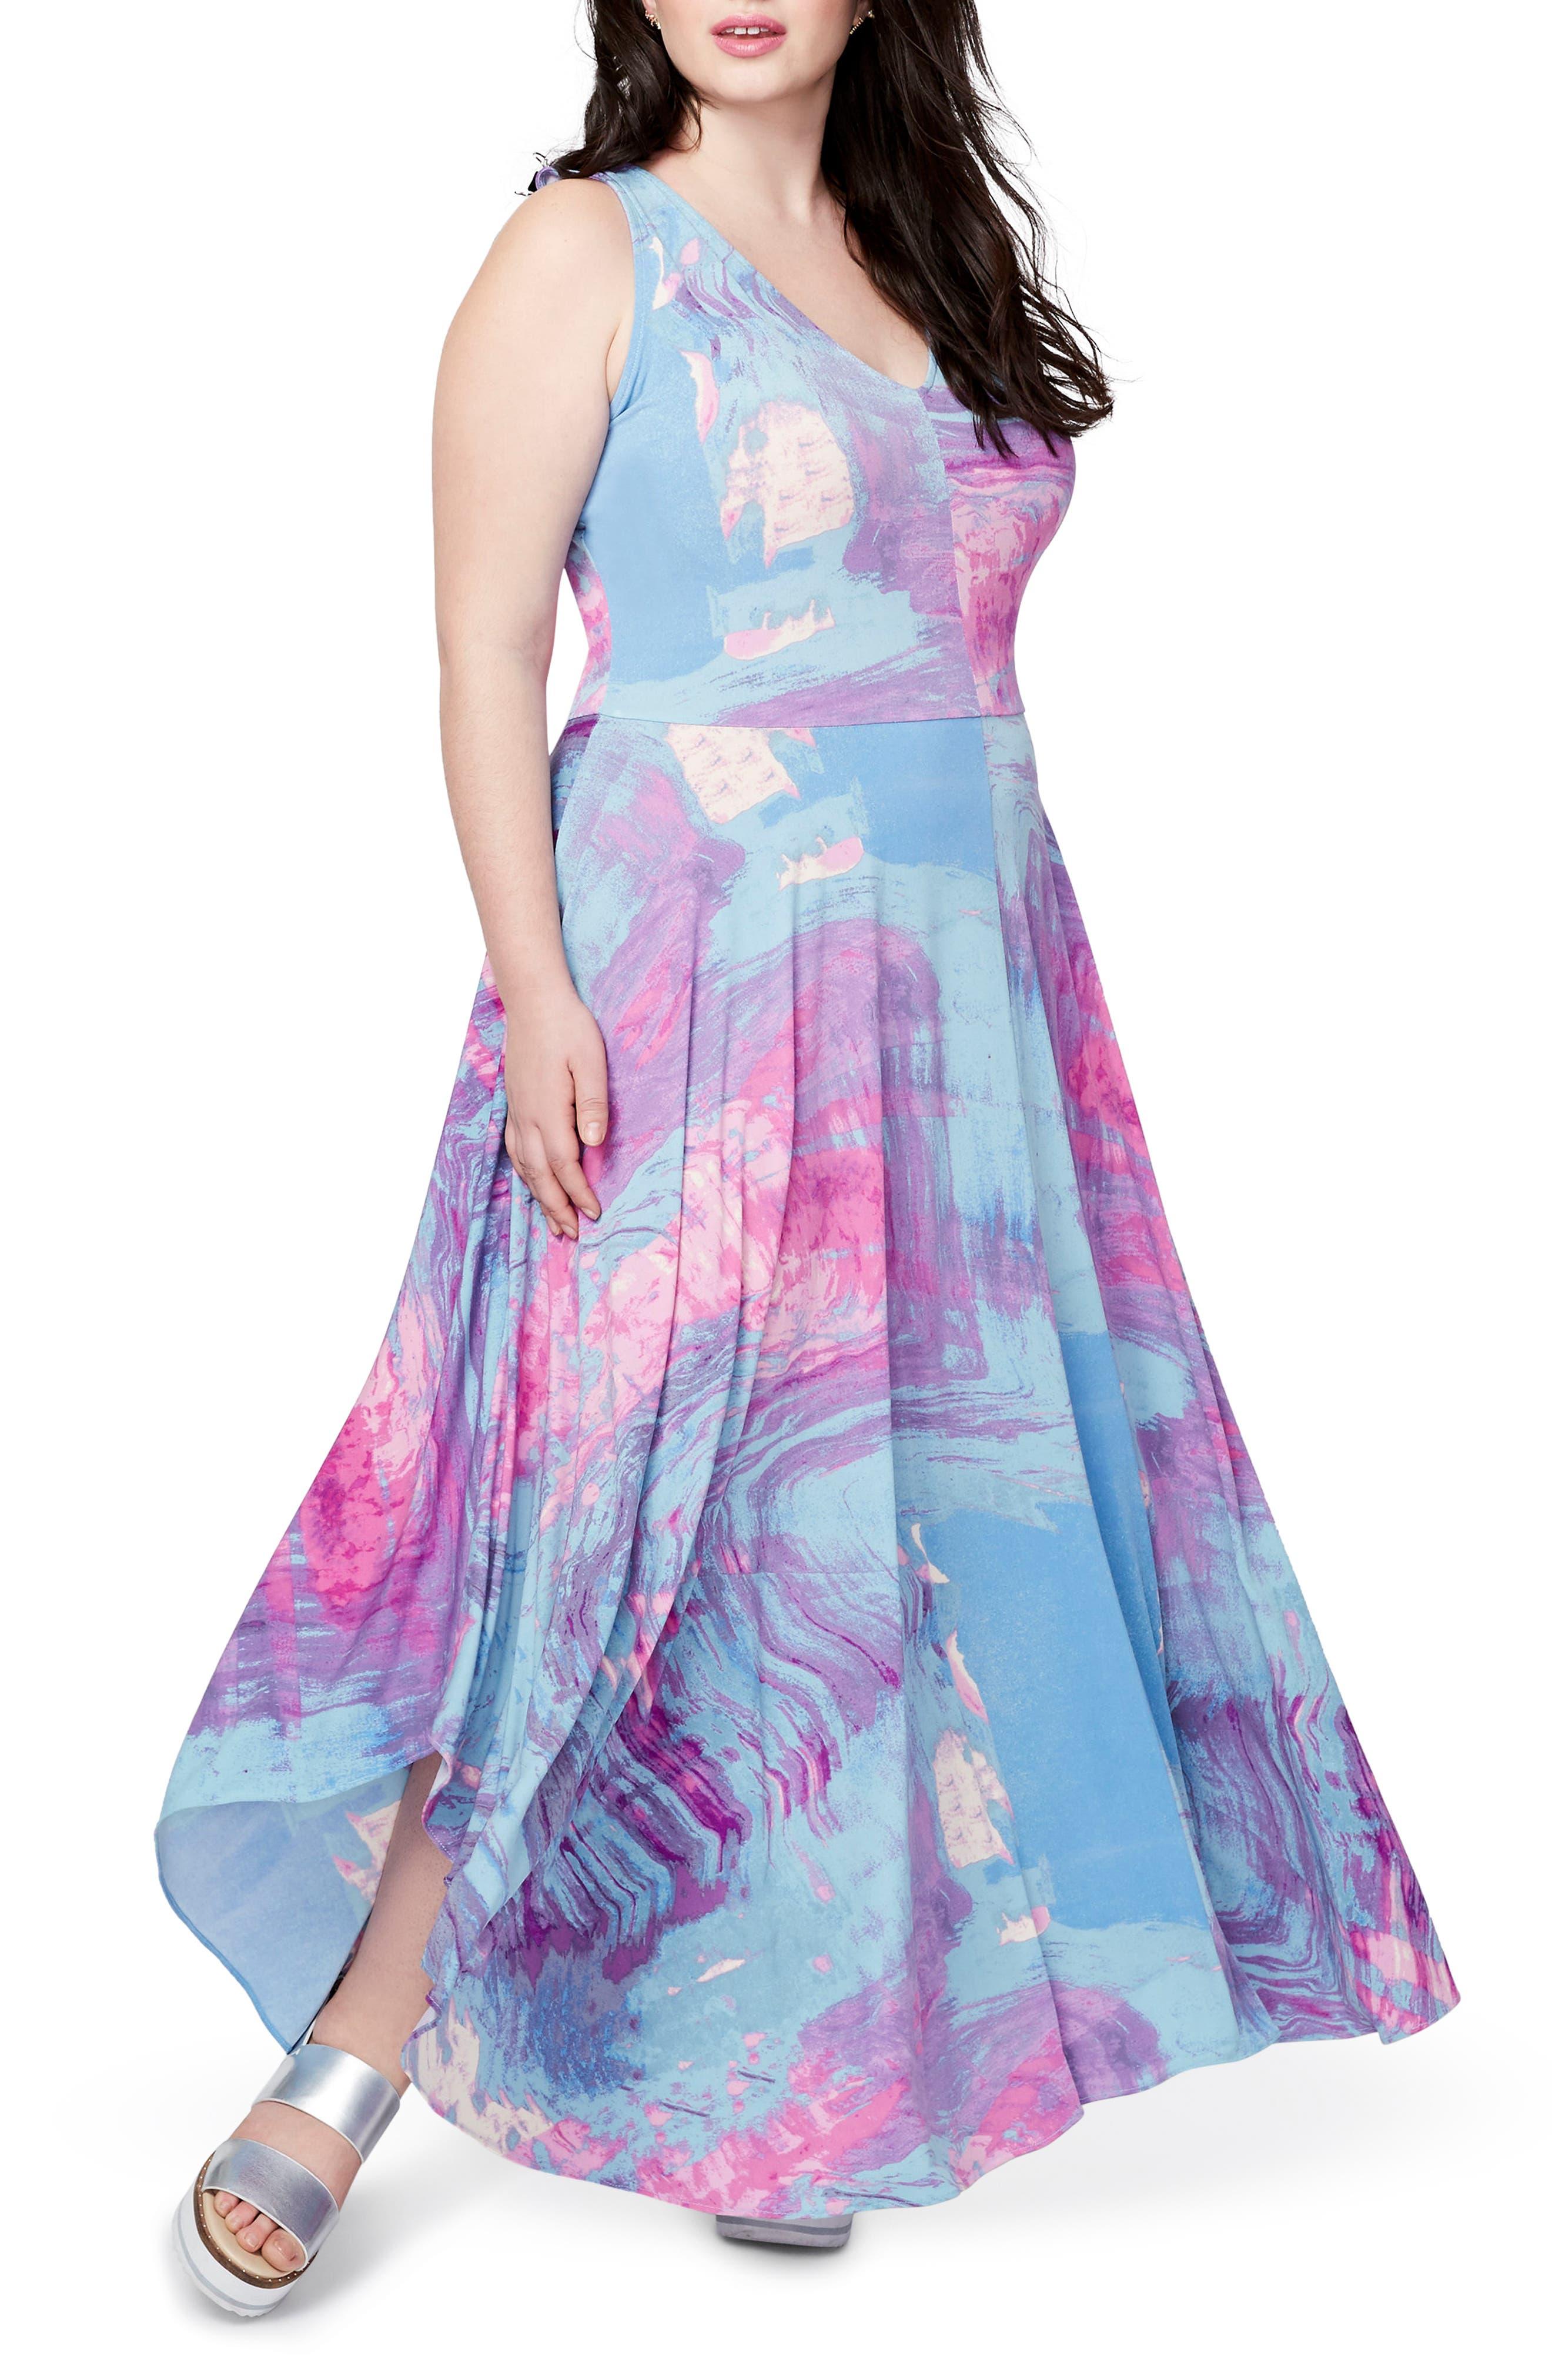 Alternate Image 1 Selected - RACHEL Rachel Roy Round Hem Print Maxi Dress (Plus Size)